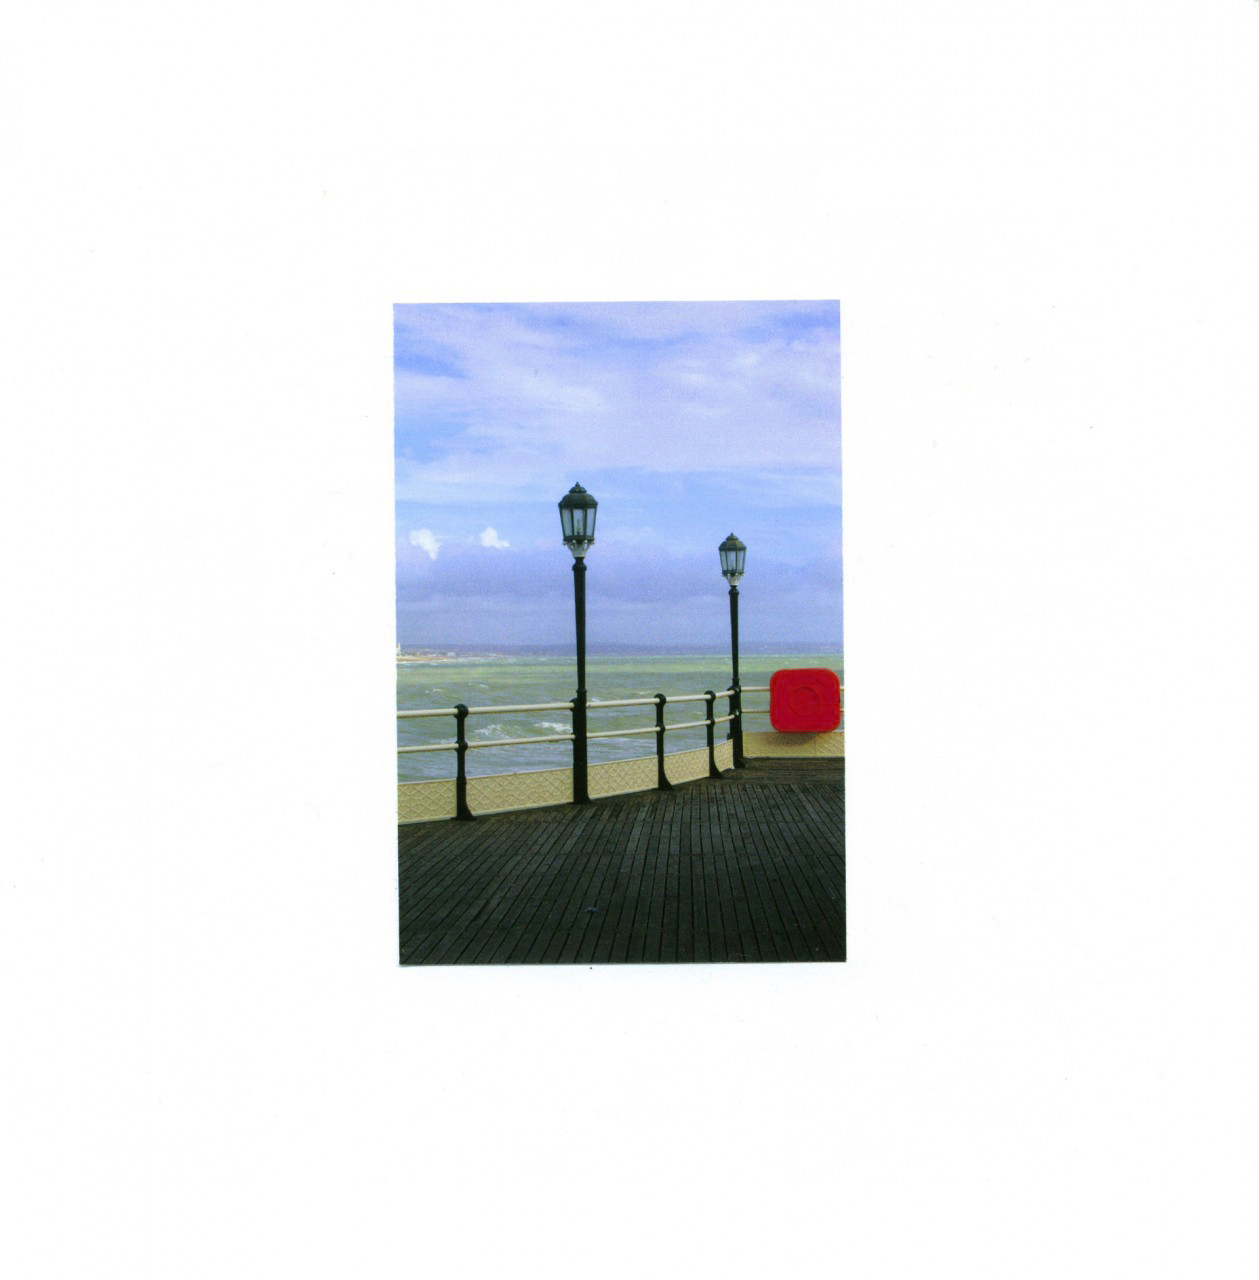 Worthing7EmilyScaife-1259x1280